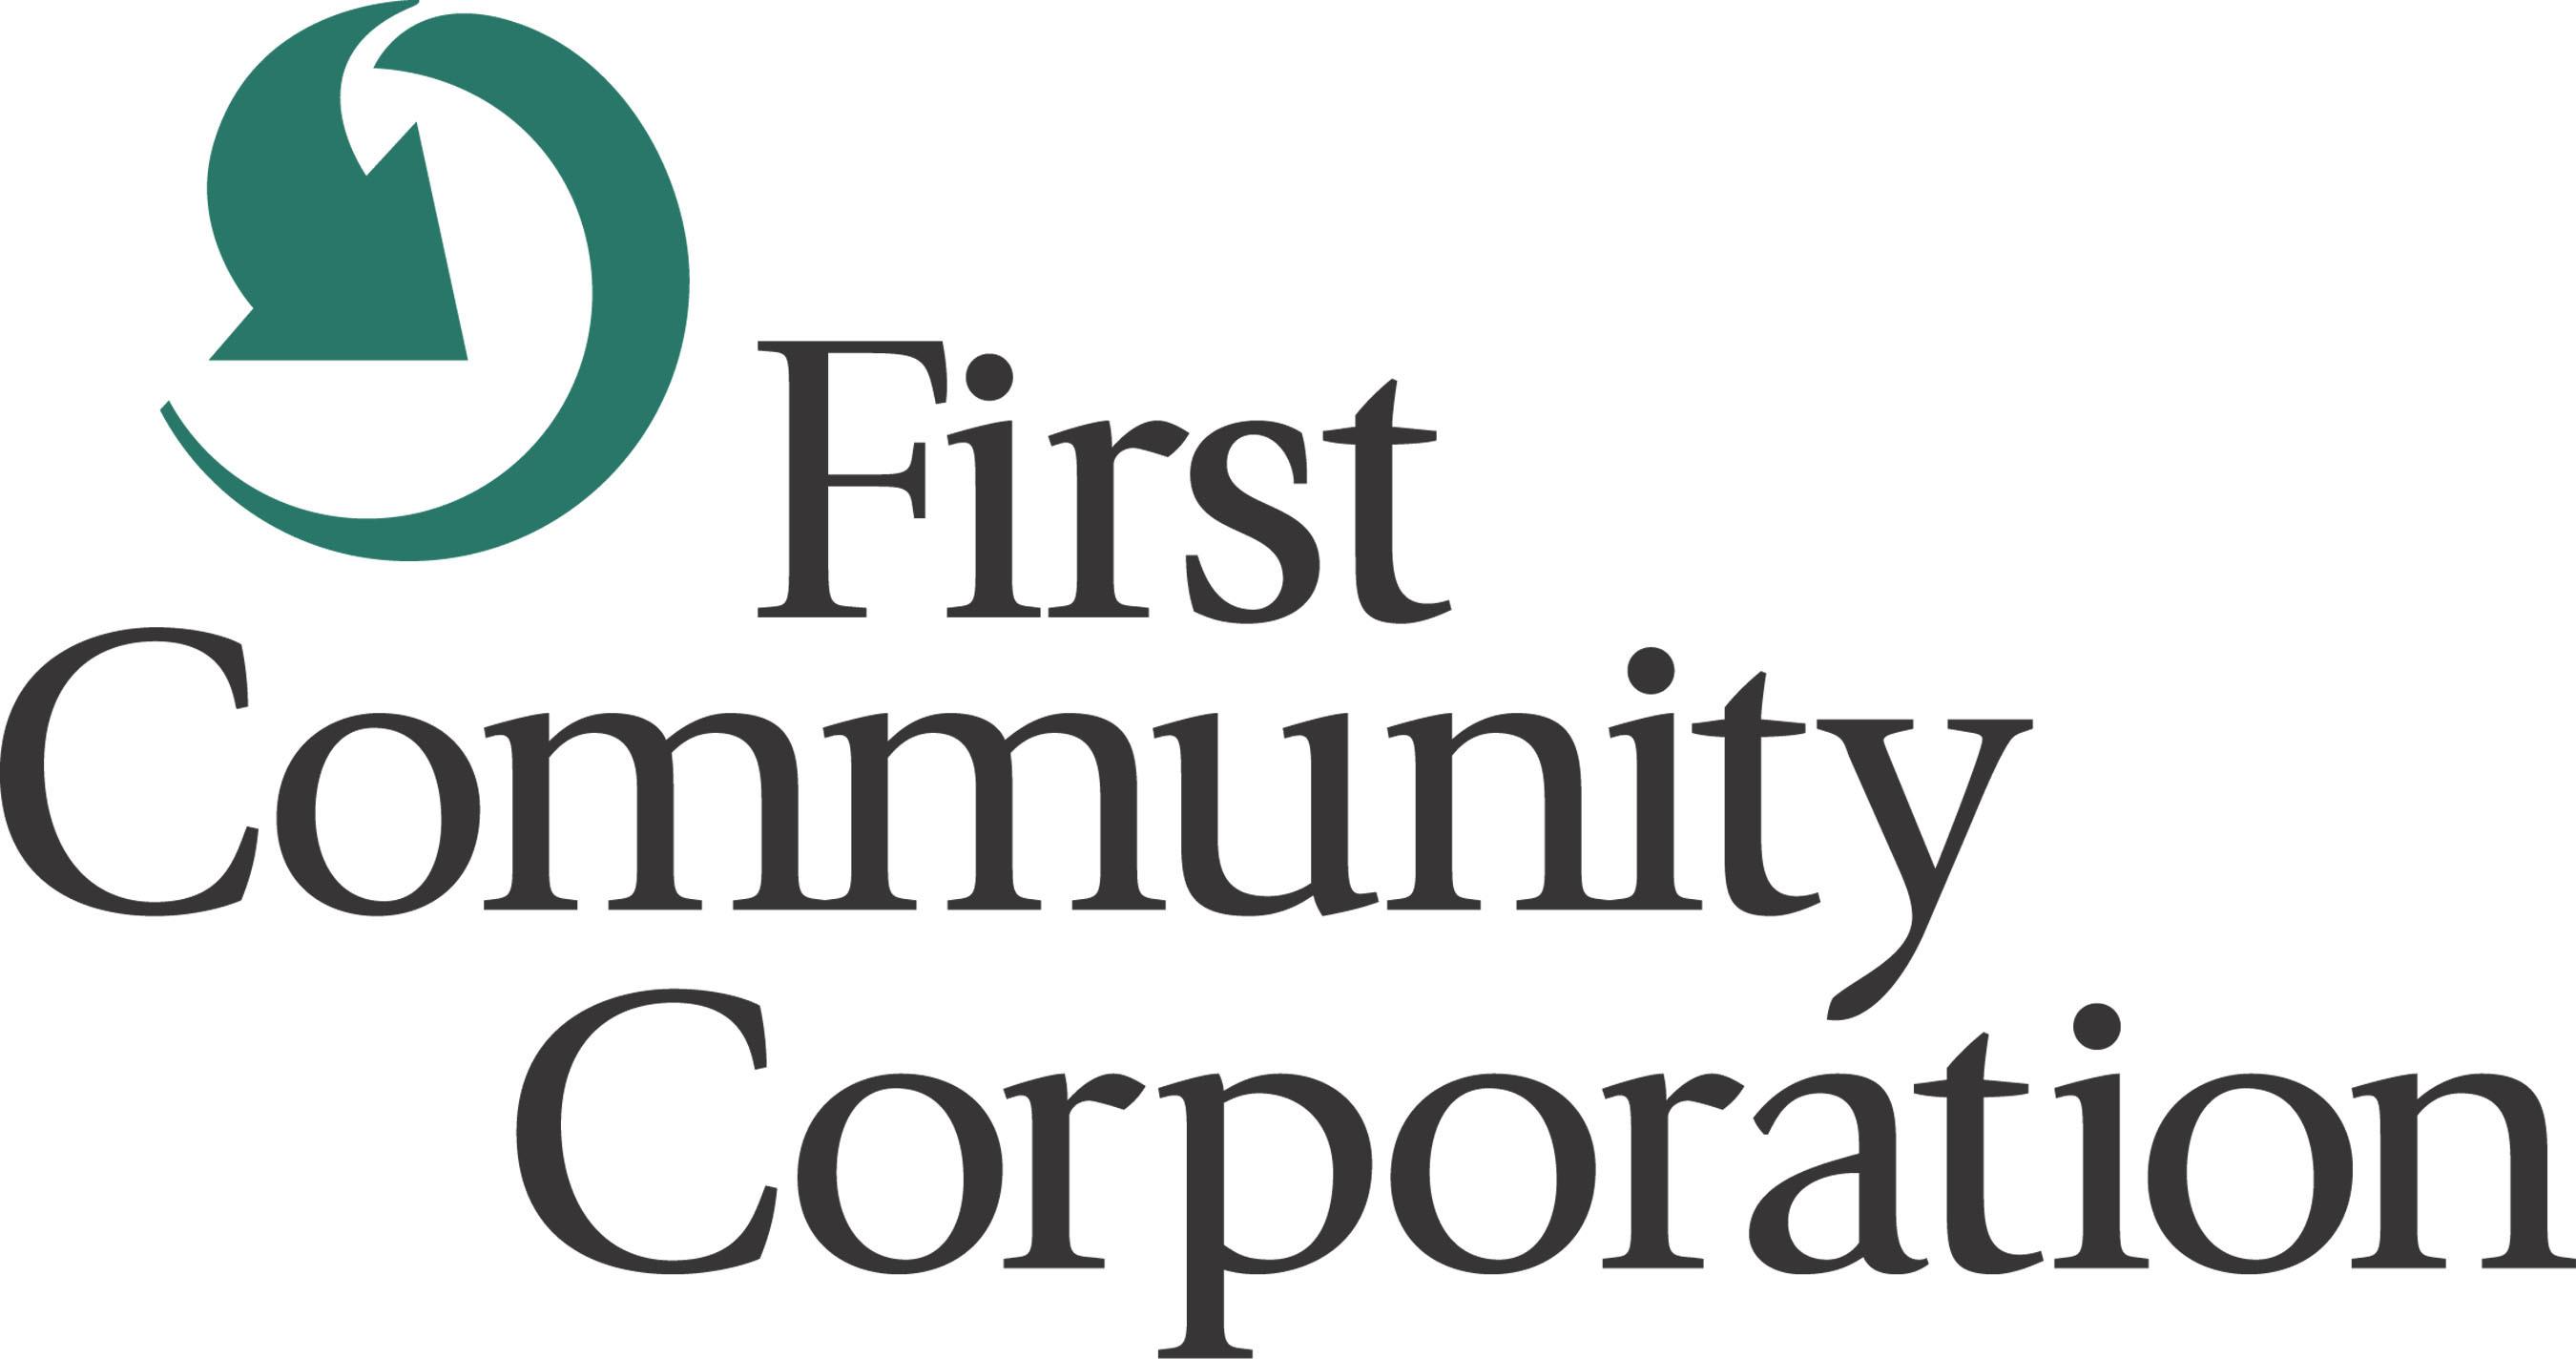 First Community Corporation logo.